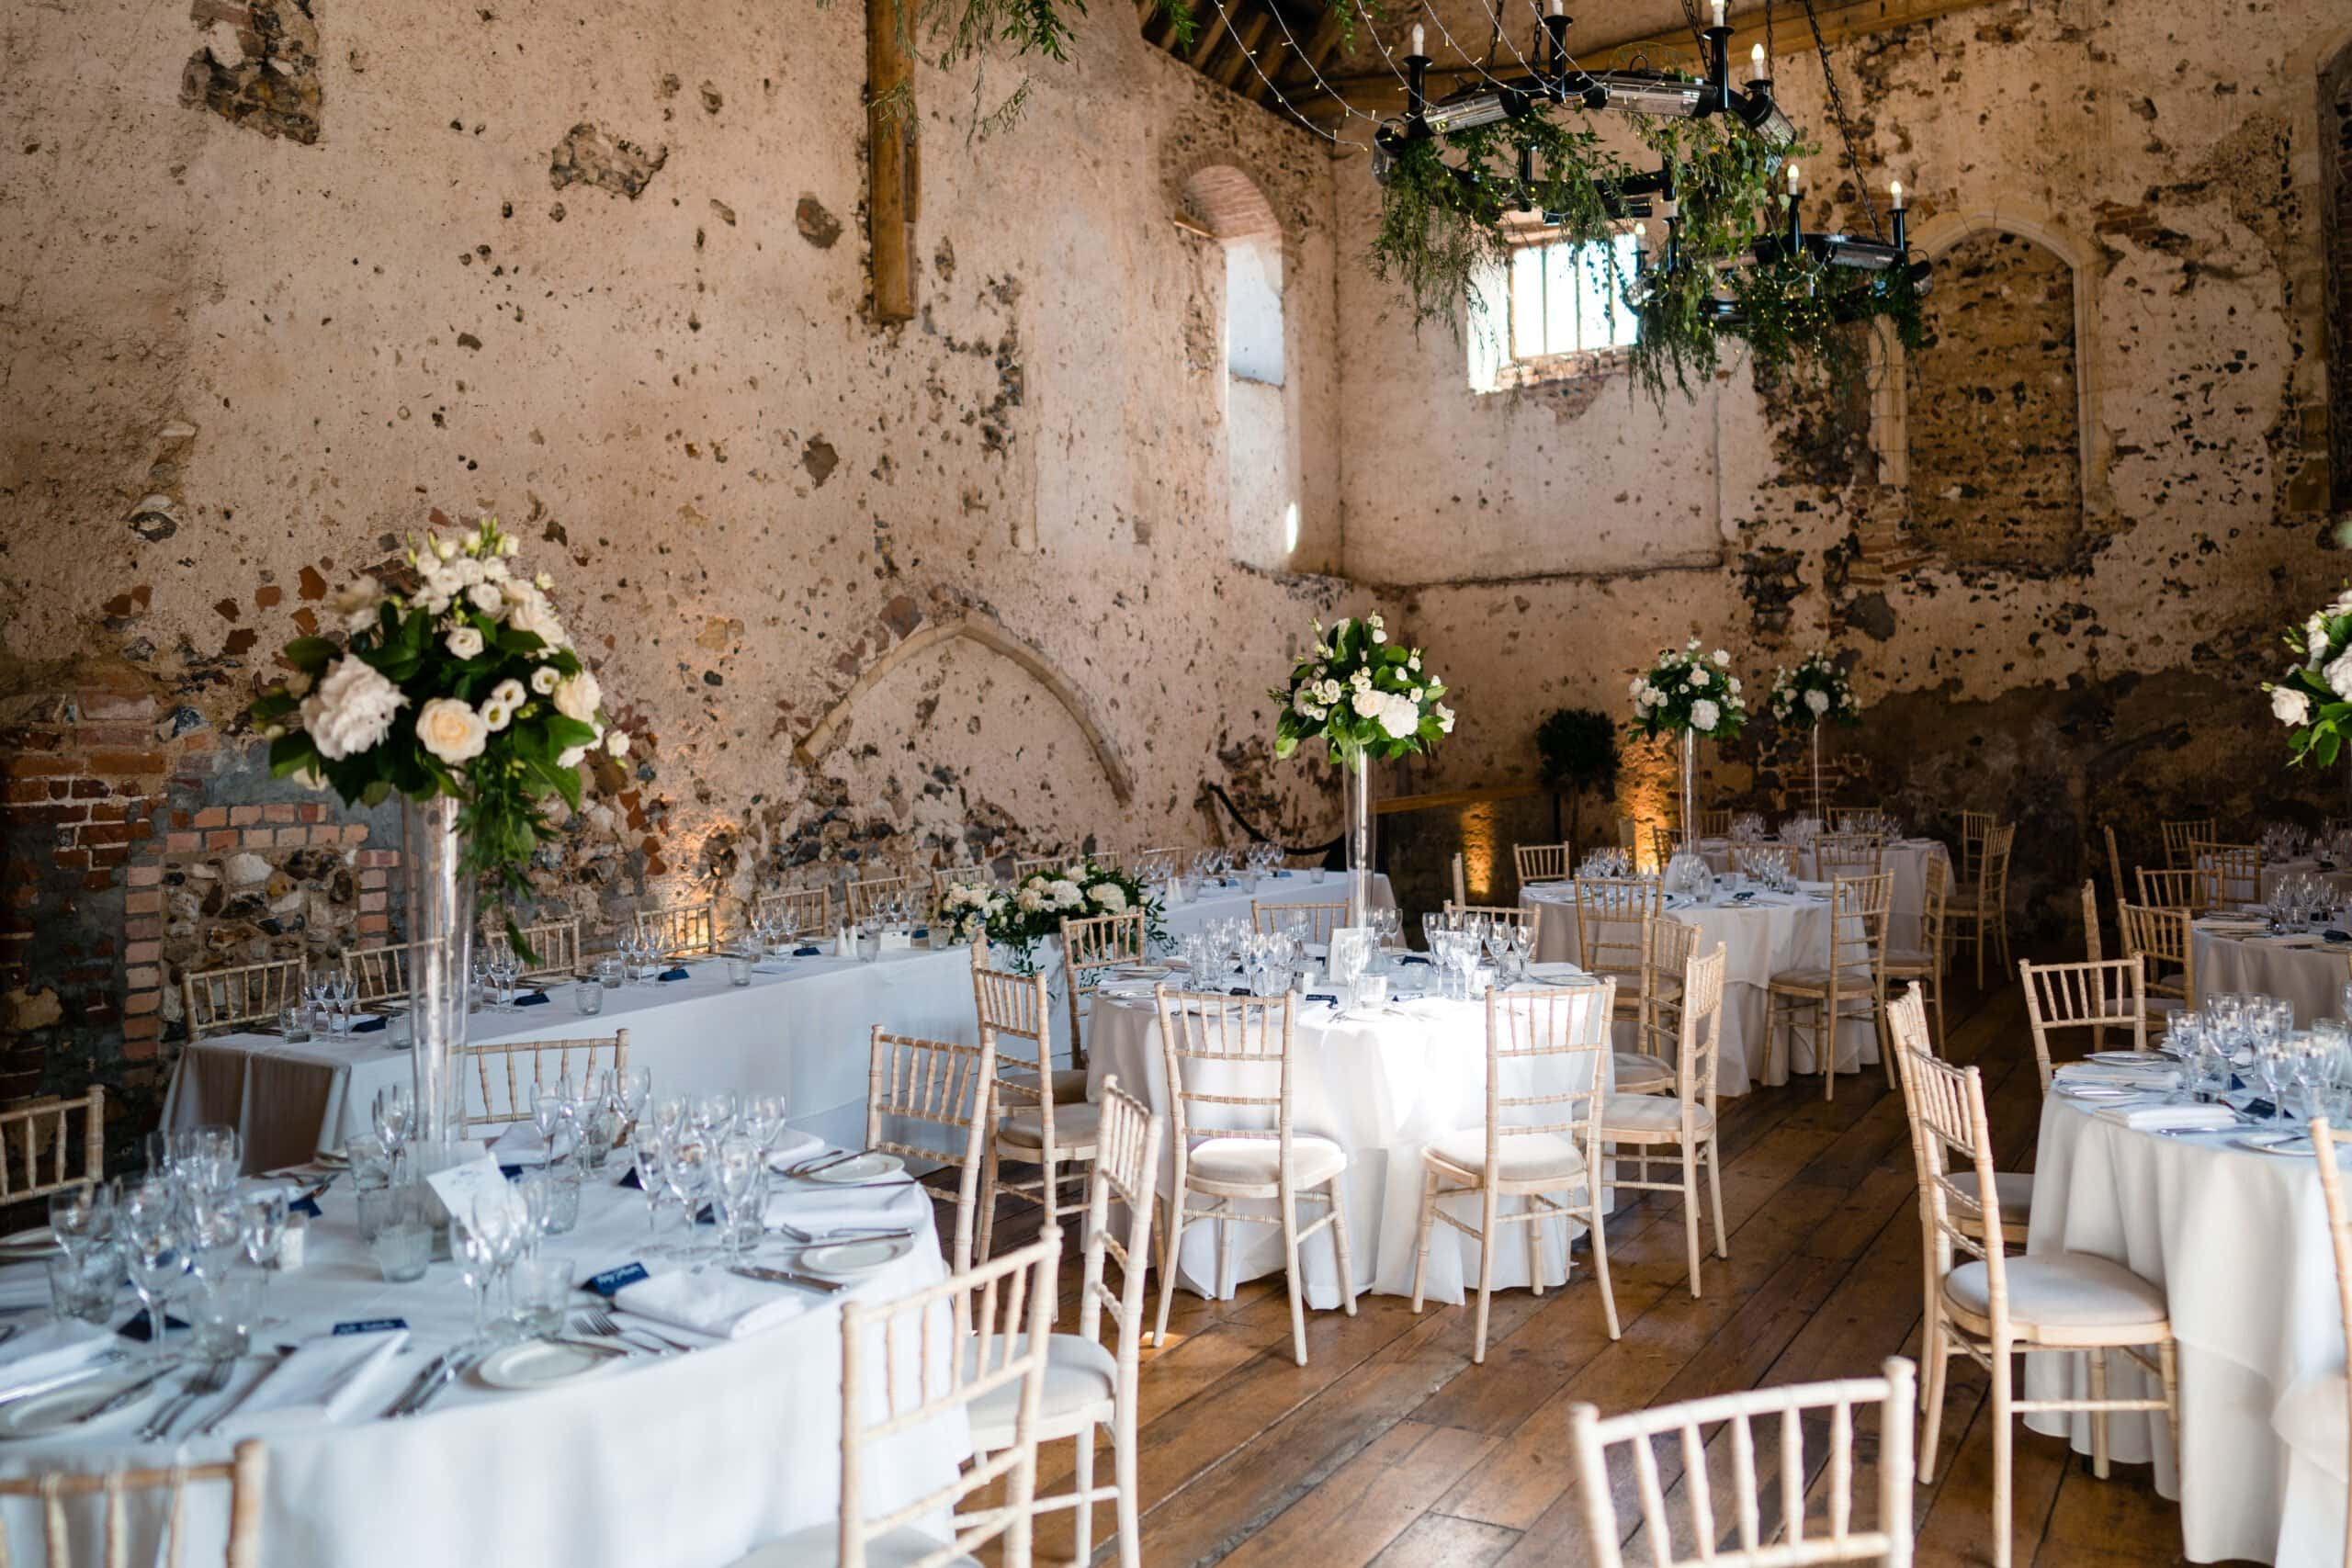 elegant wedding decorations at Langley Abbey wedding norfolk